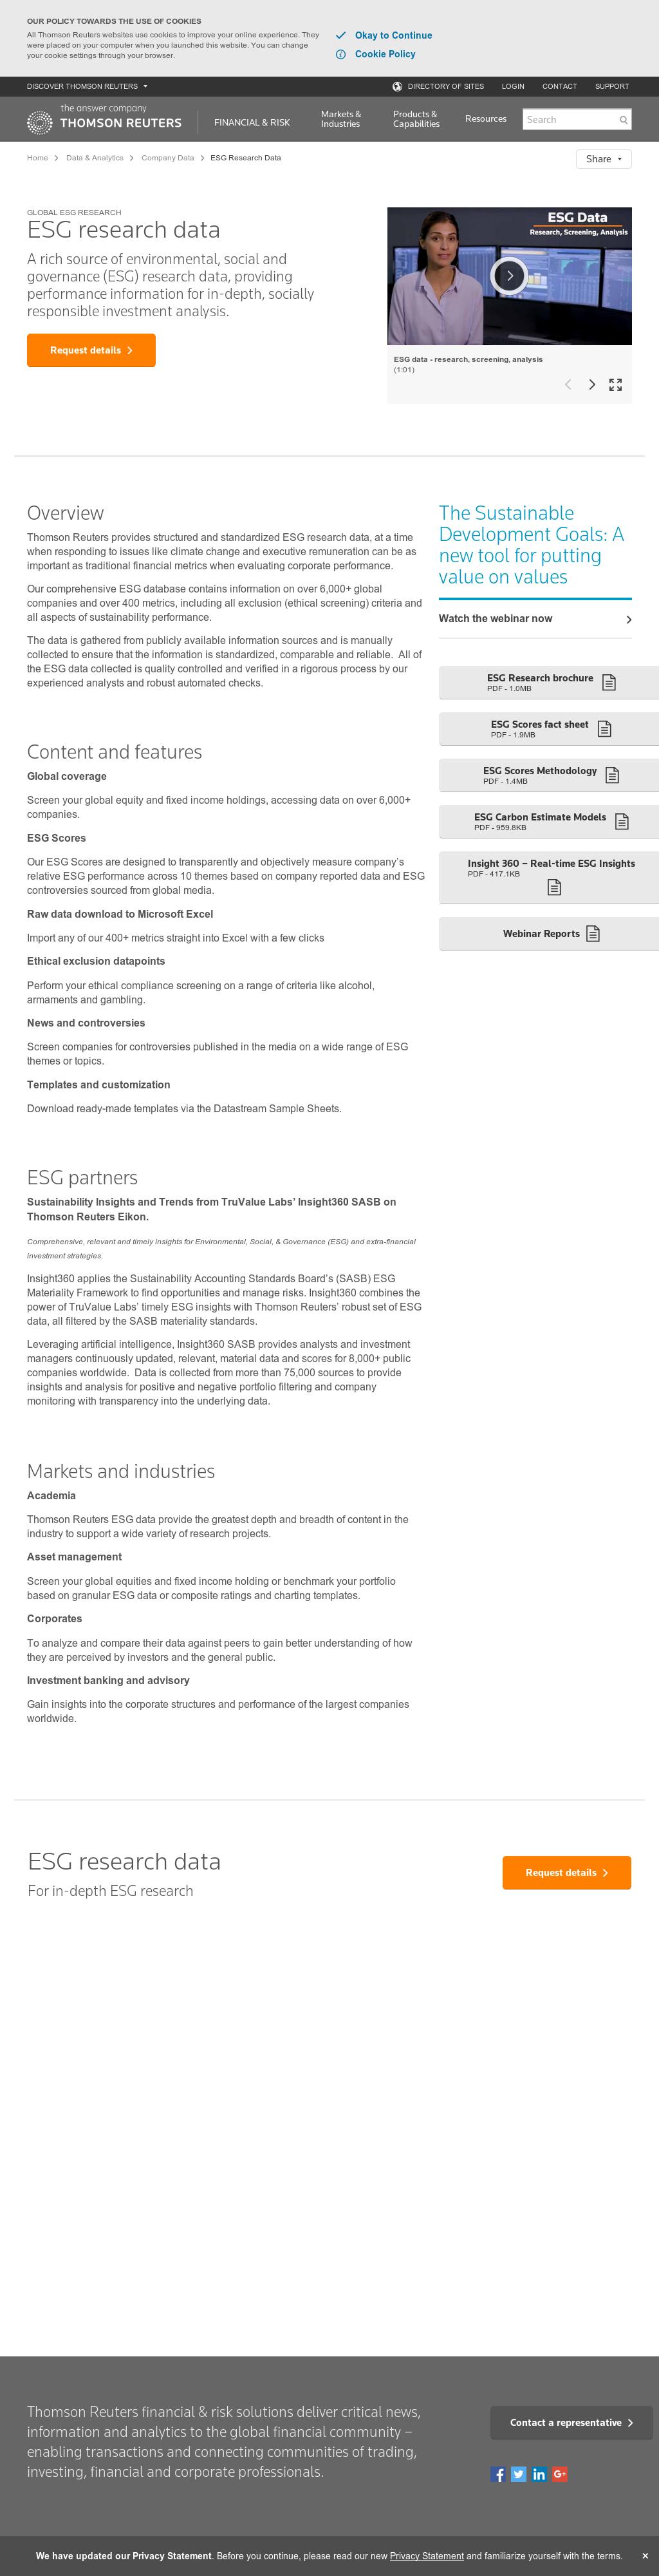 Request details about our ESG data